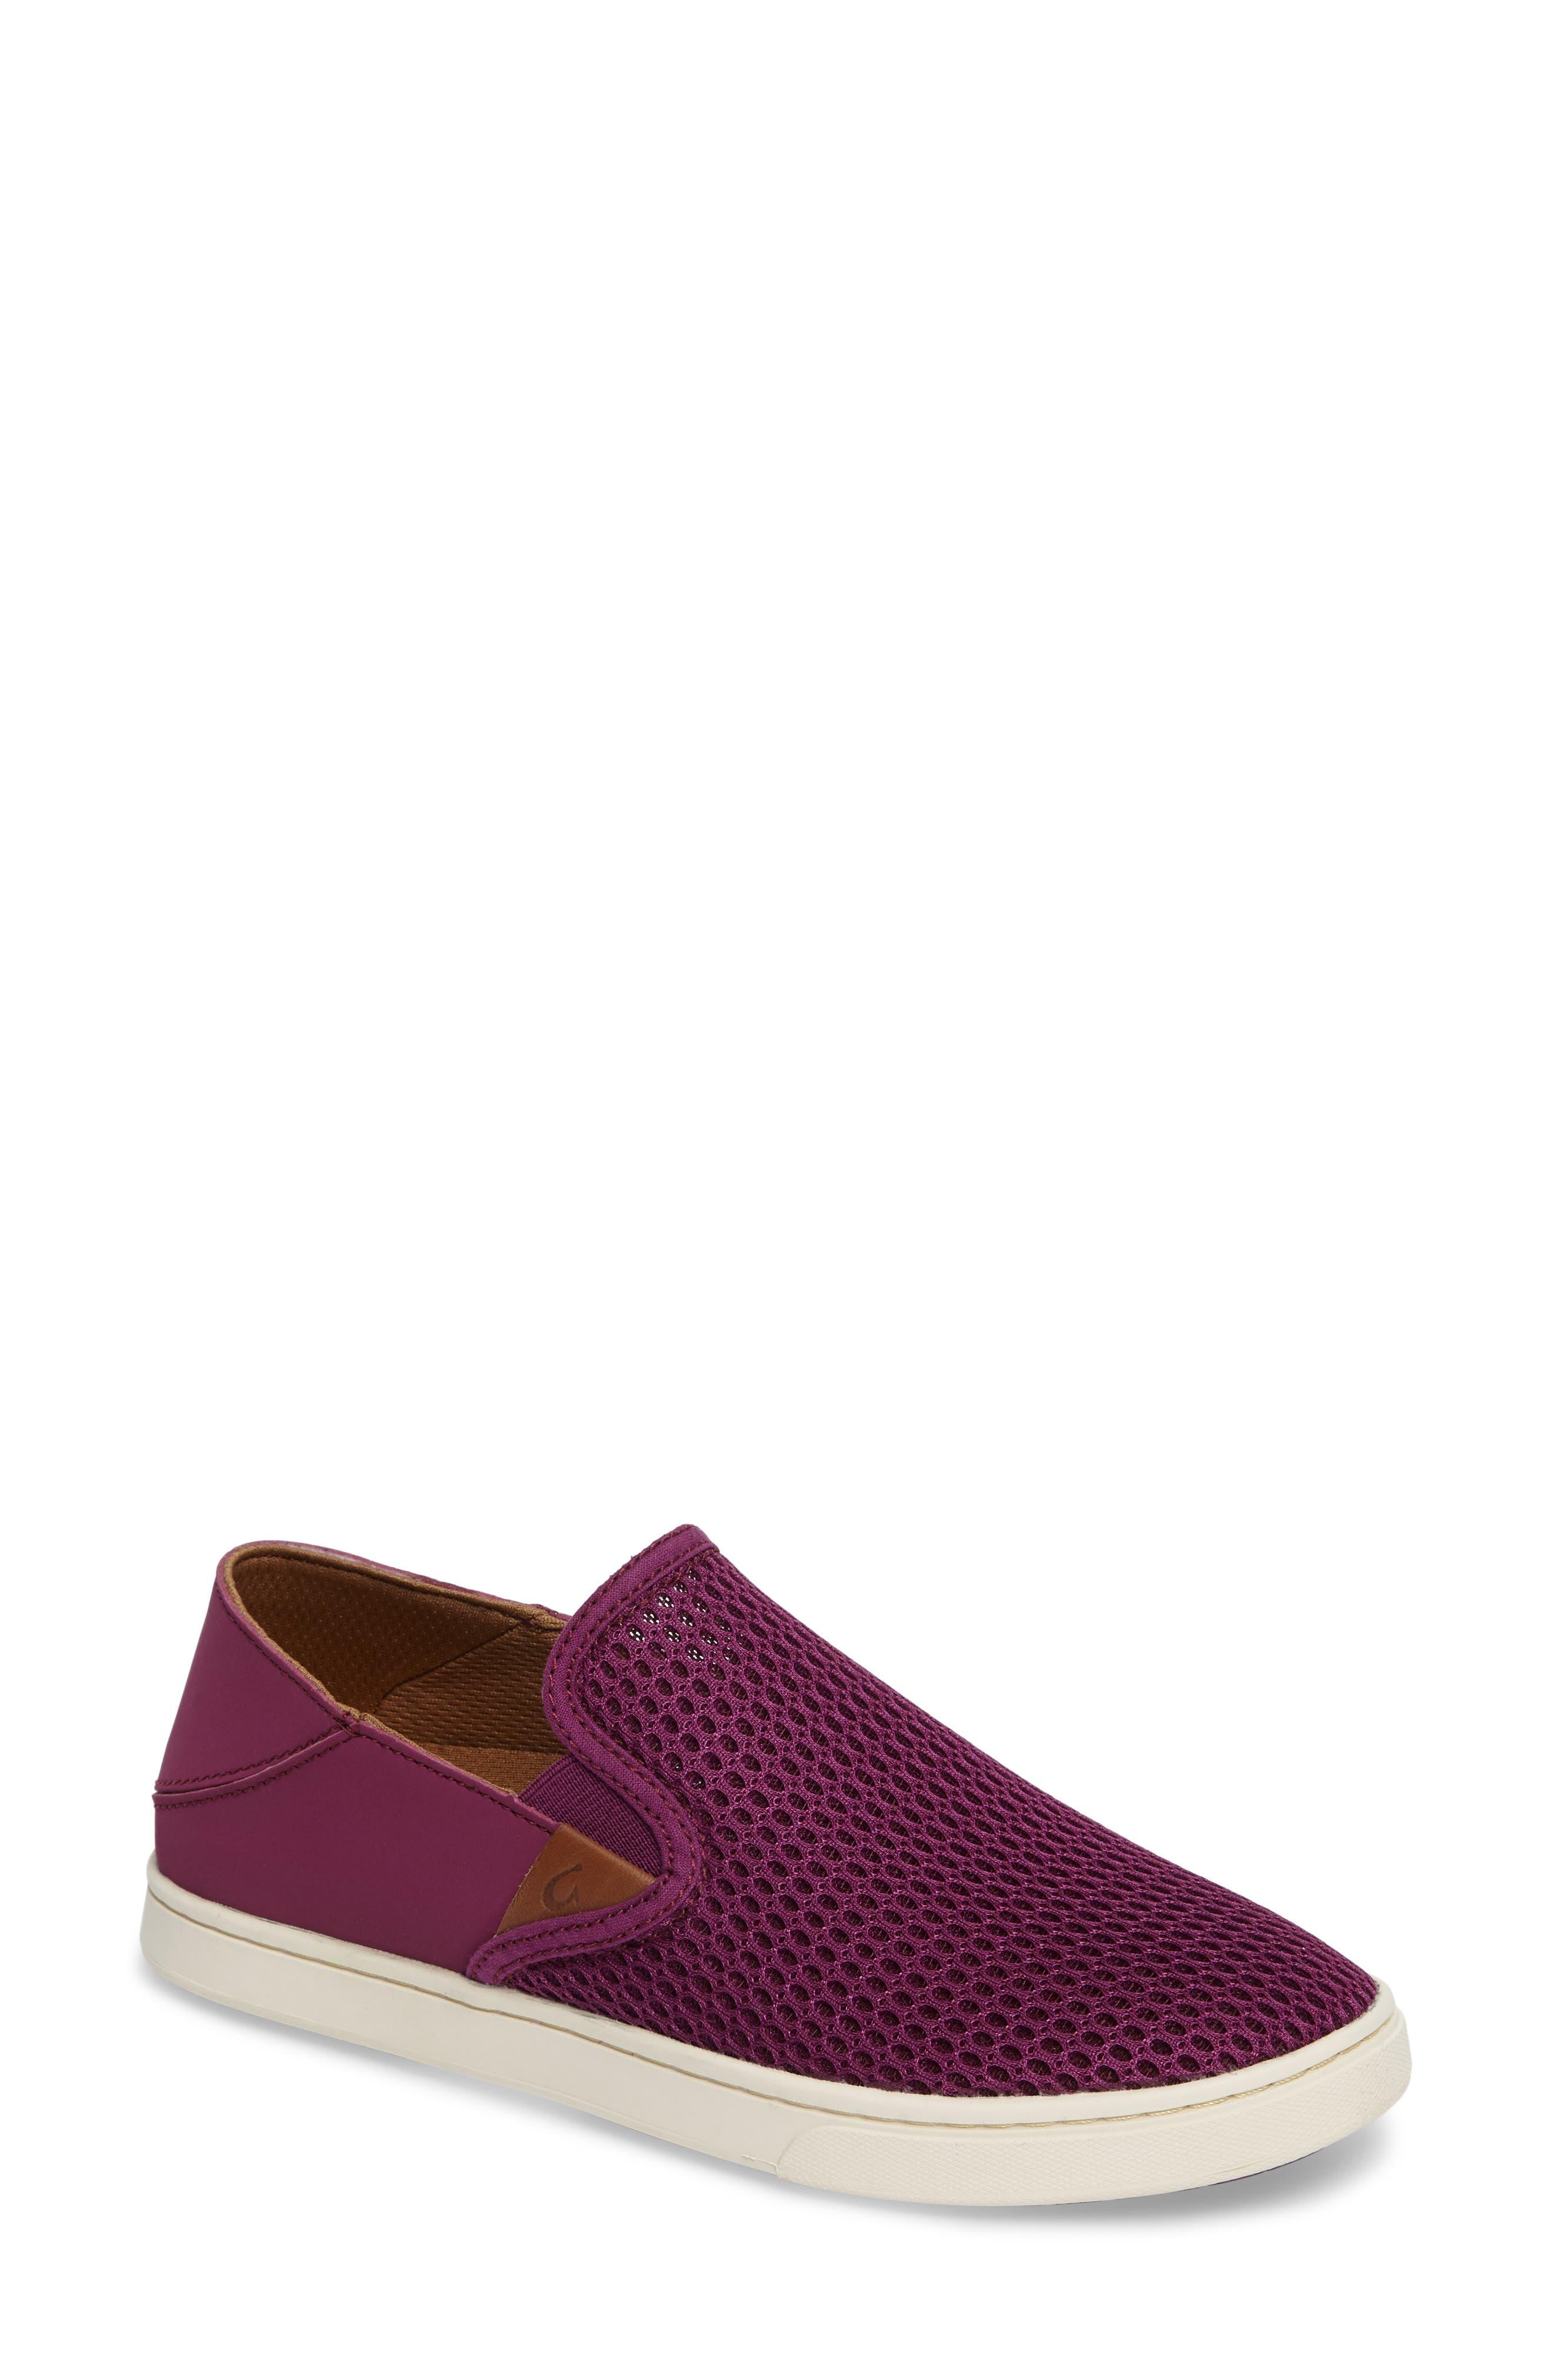 Alternate Image 1 Selected - OluKai 'Pehuea' Slip-On Sneaker (Women)